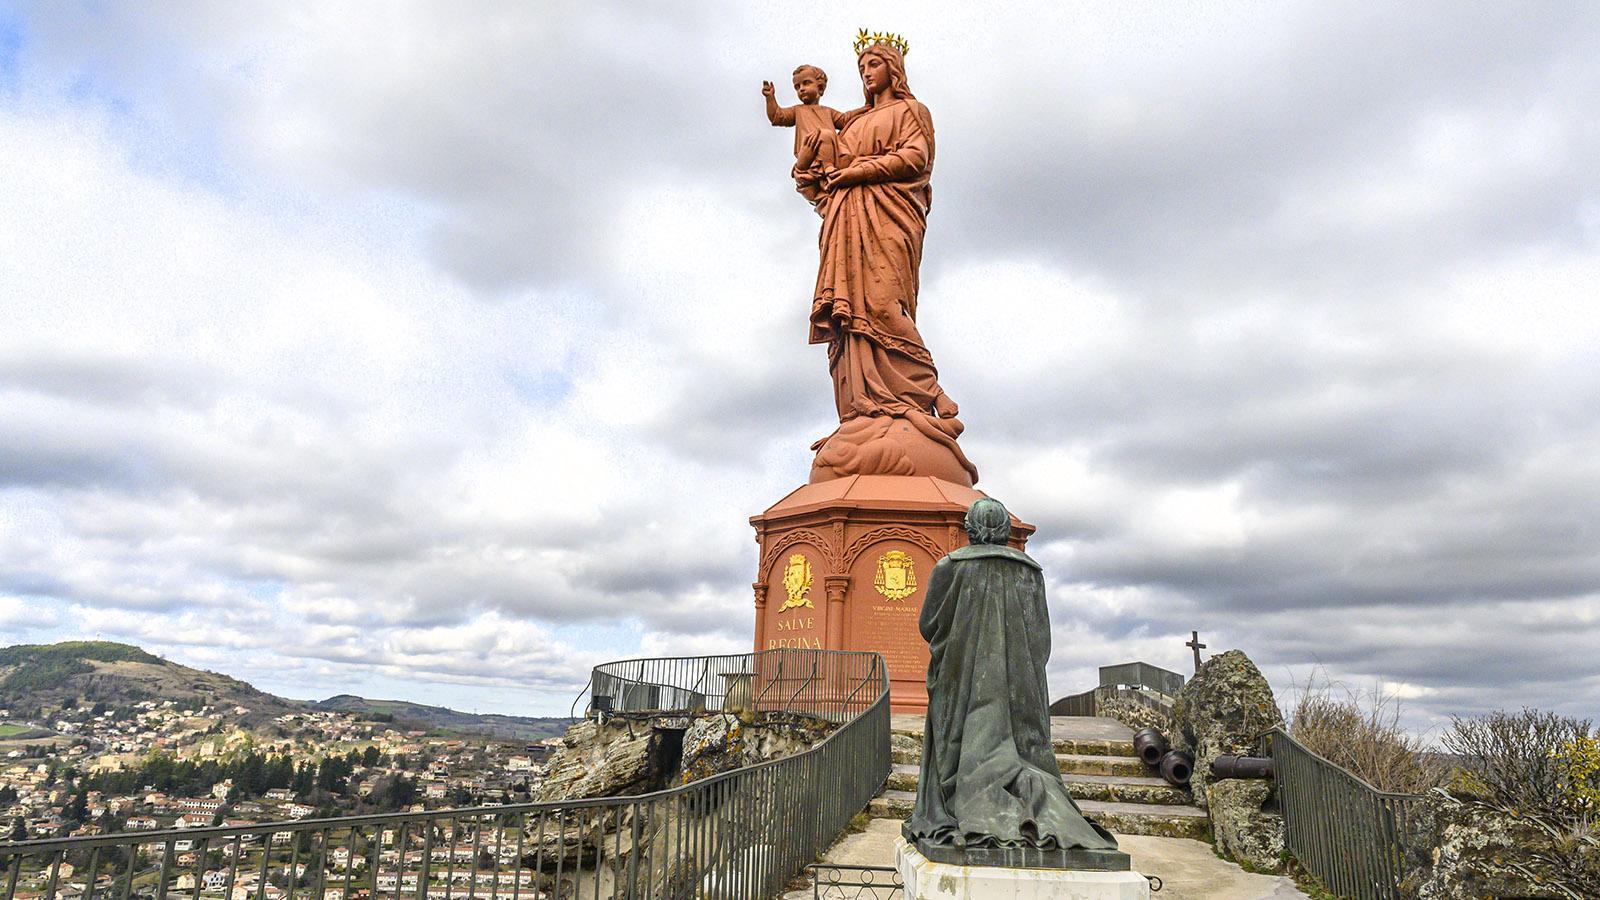 In Le Puy-en-Velay wacht die Dame La France über die Pilgerstadt an der Loire. Foto: Hilke Maunder